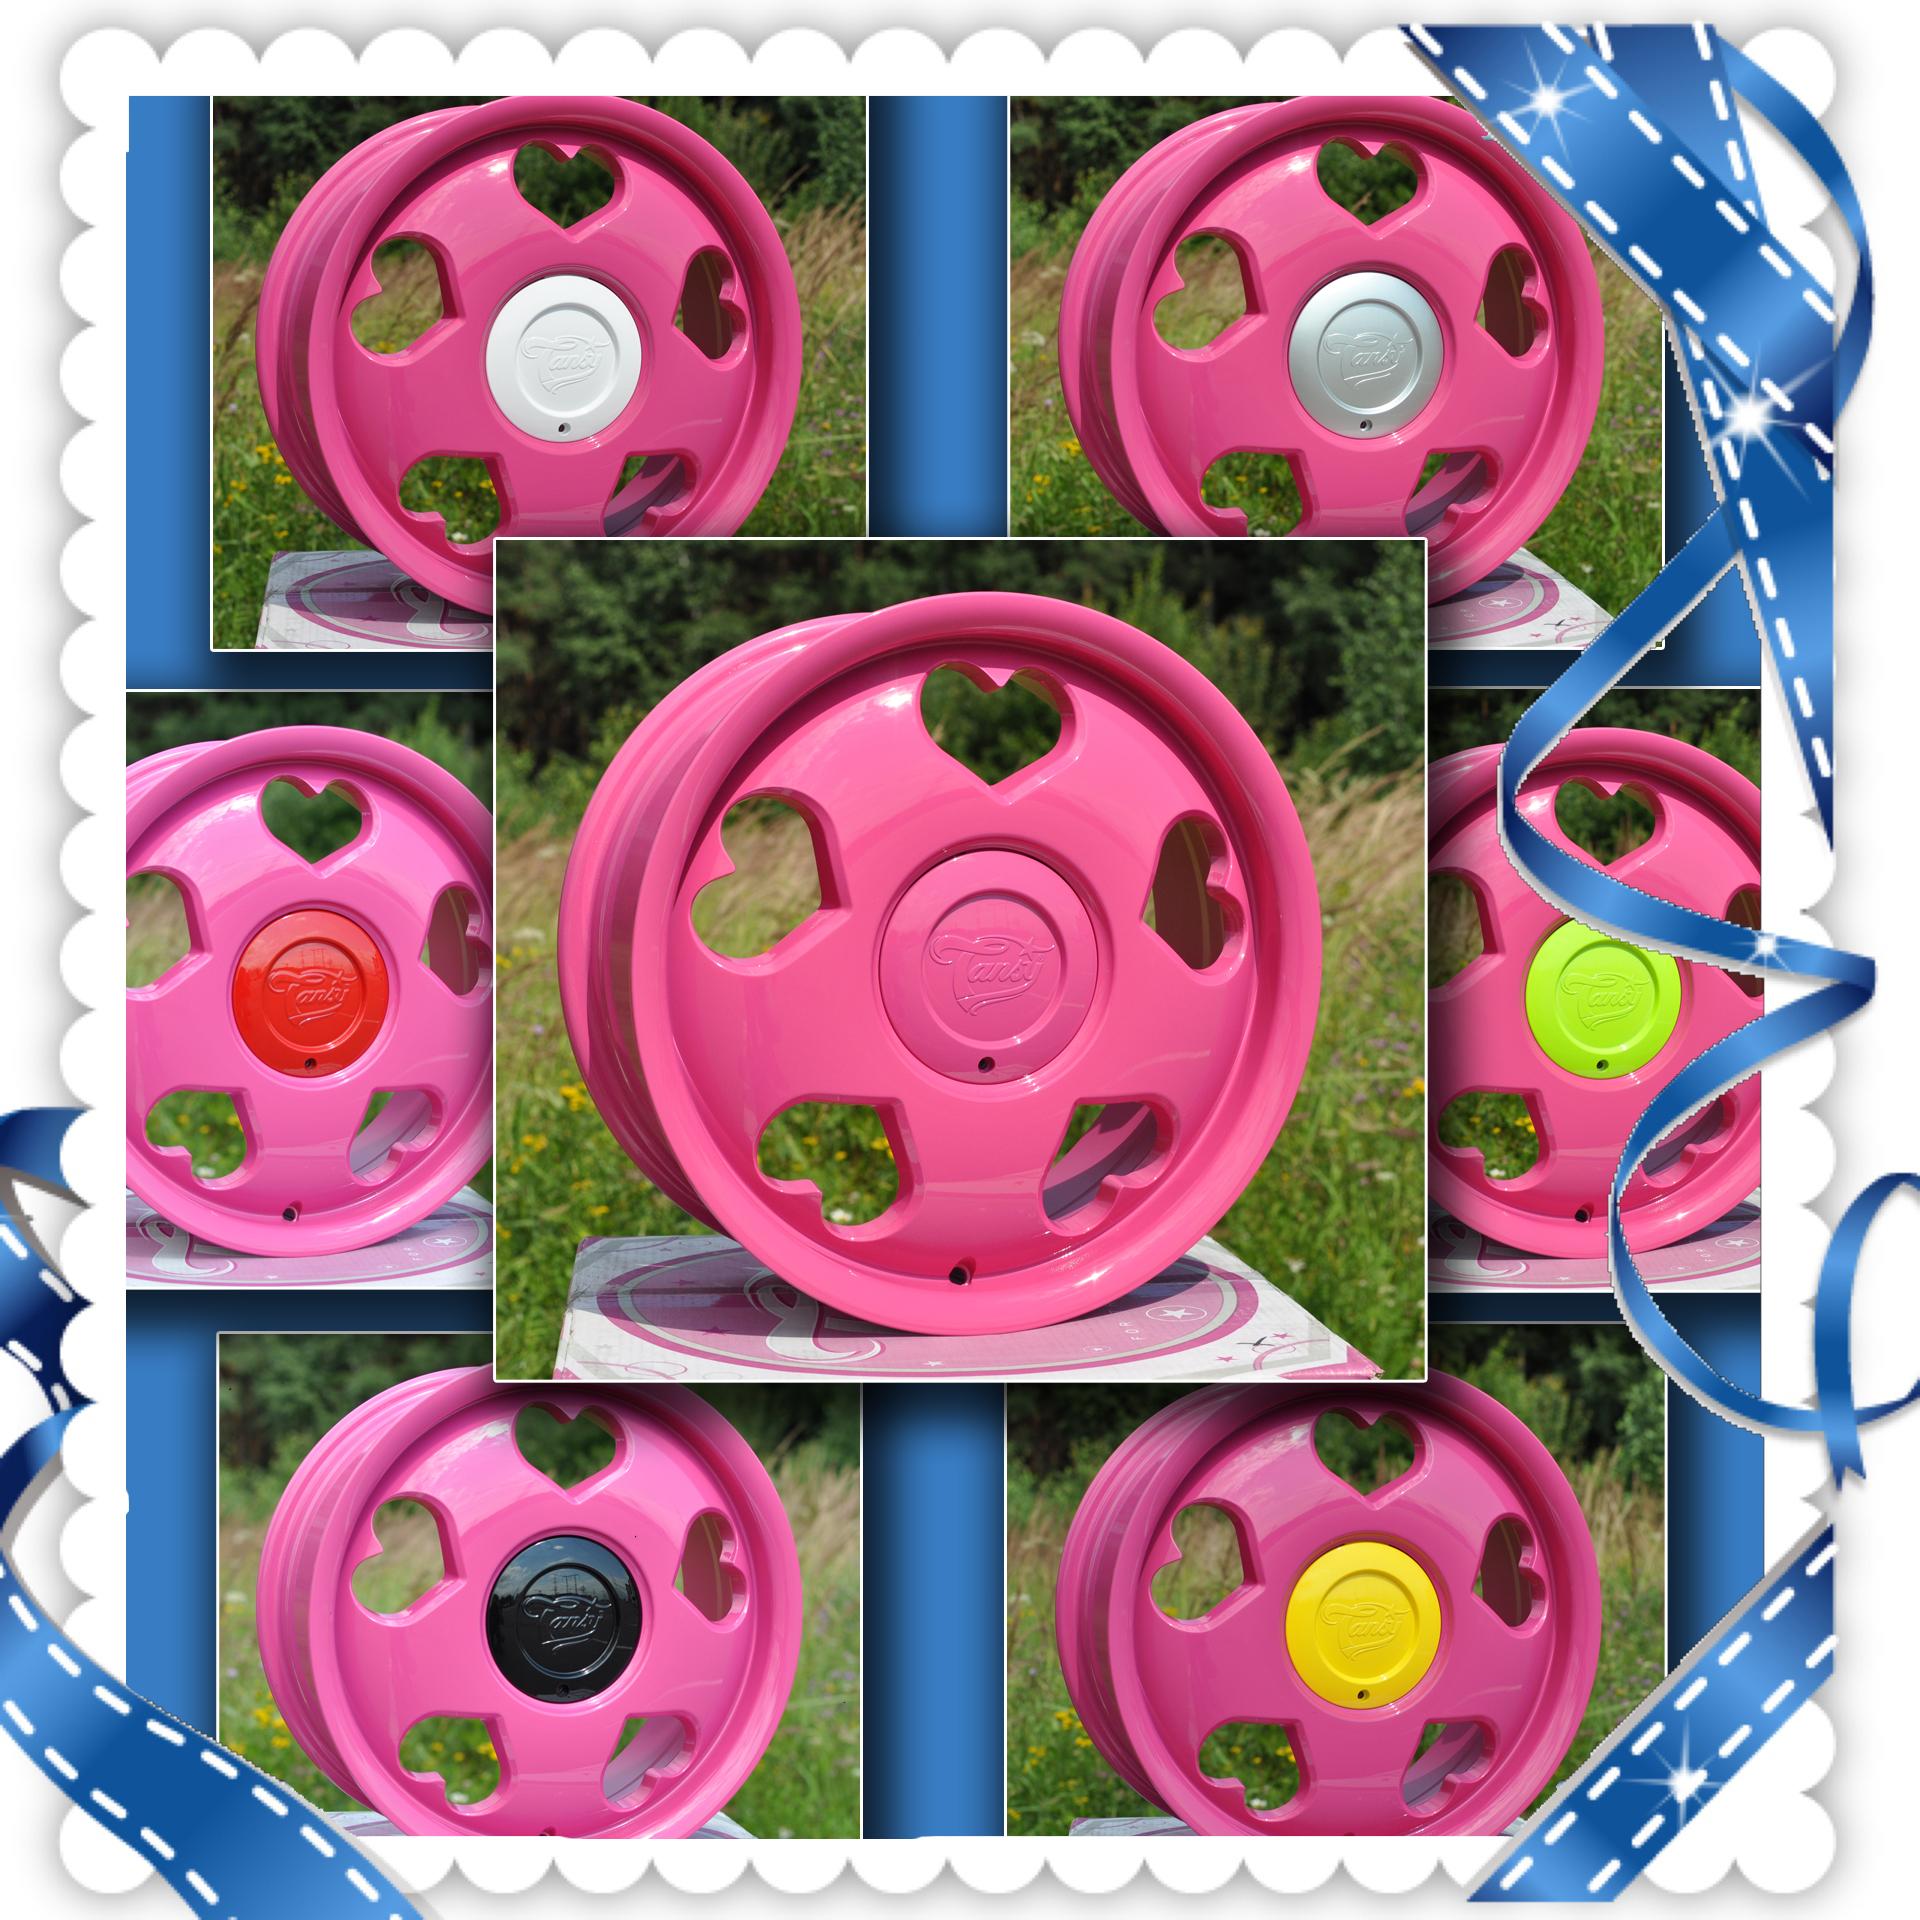 красивые диски; модные диски; розовые диски на авто